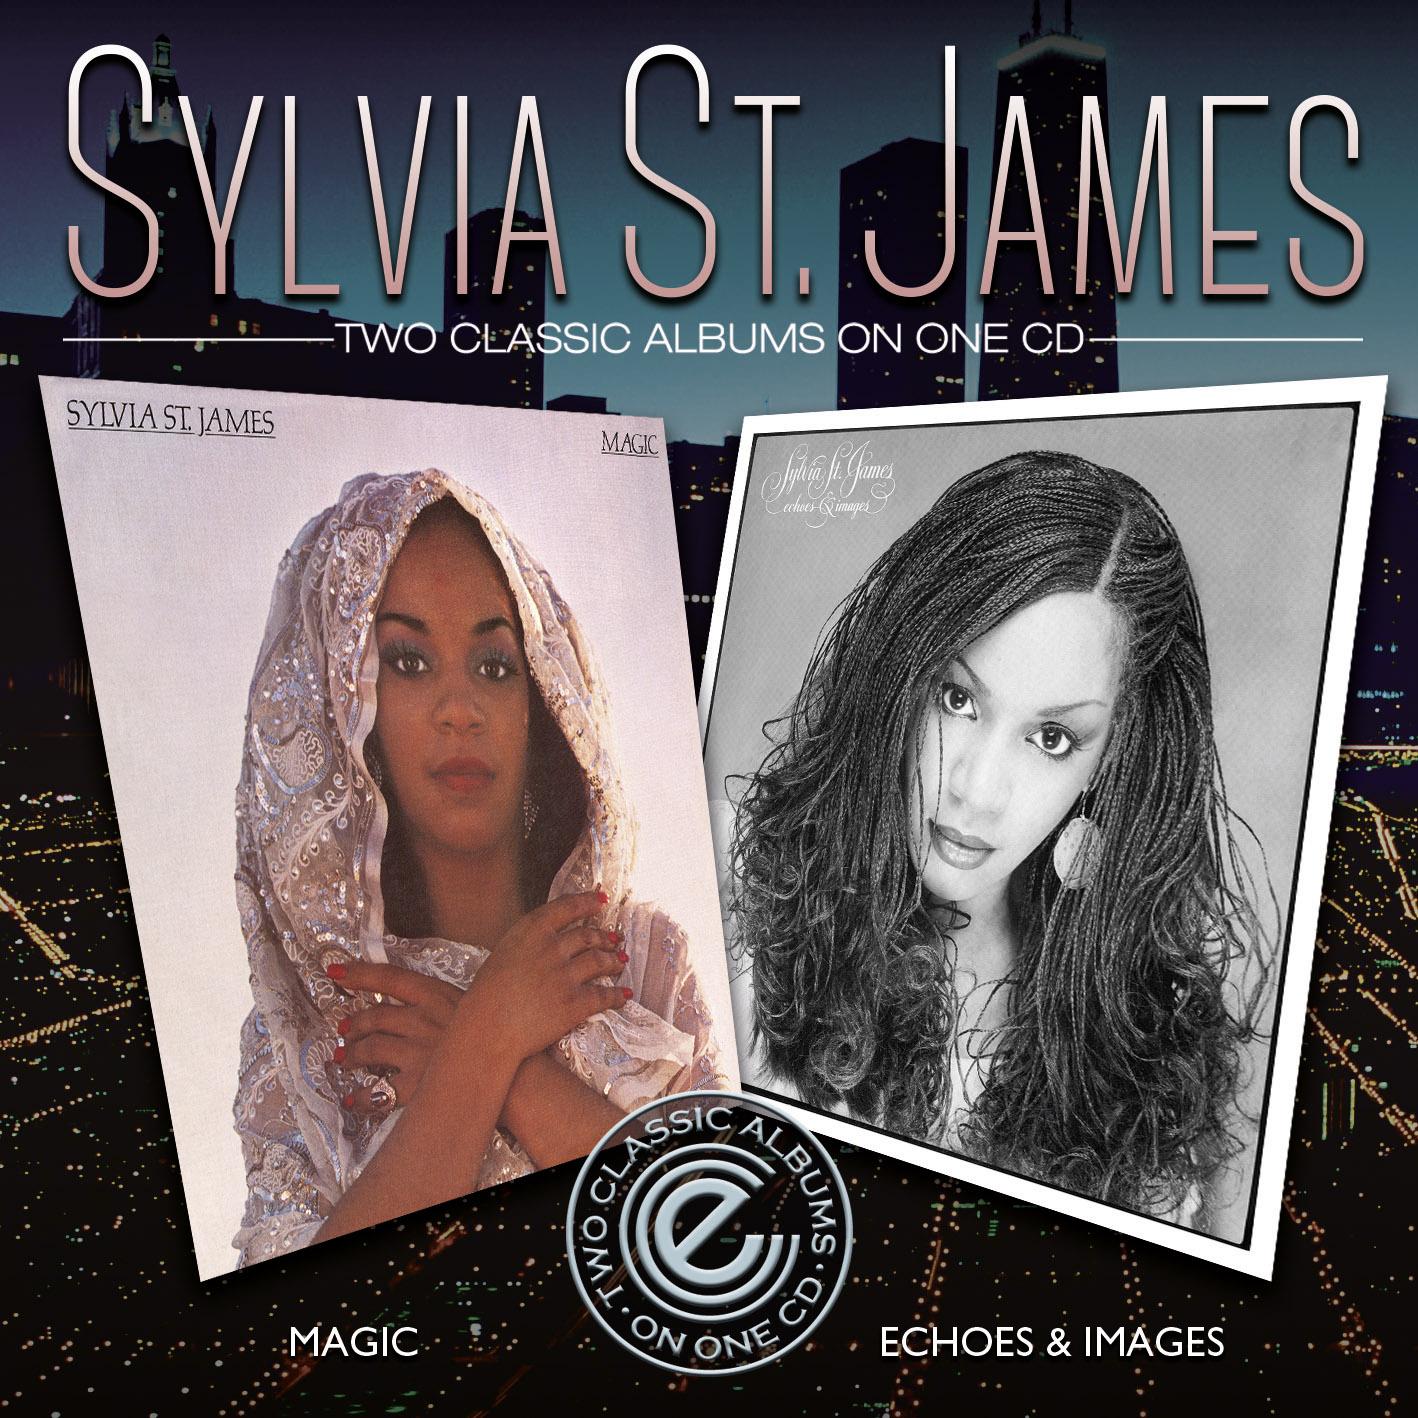 Sylvia St James/MAGIC & ECHOES IMAGES CD